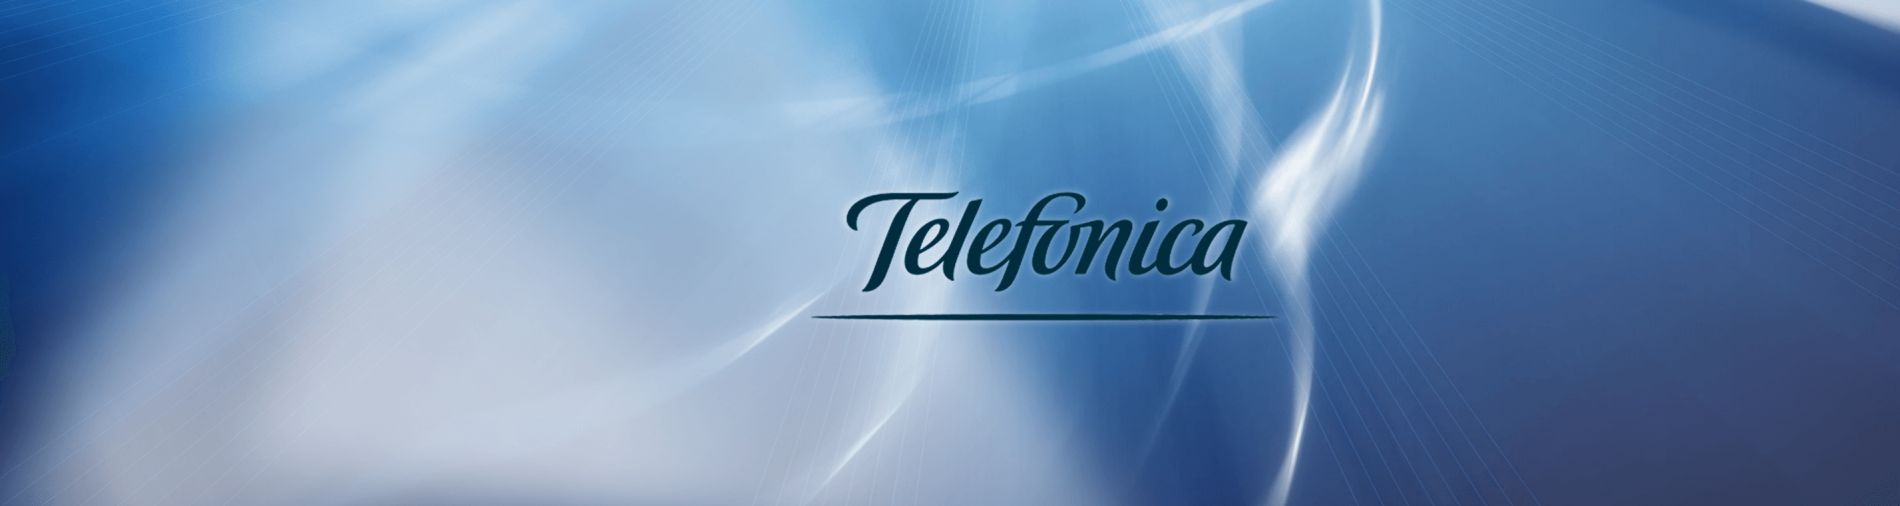 Telefonica Banner Compressed